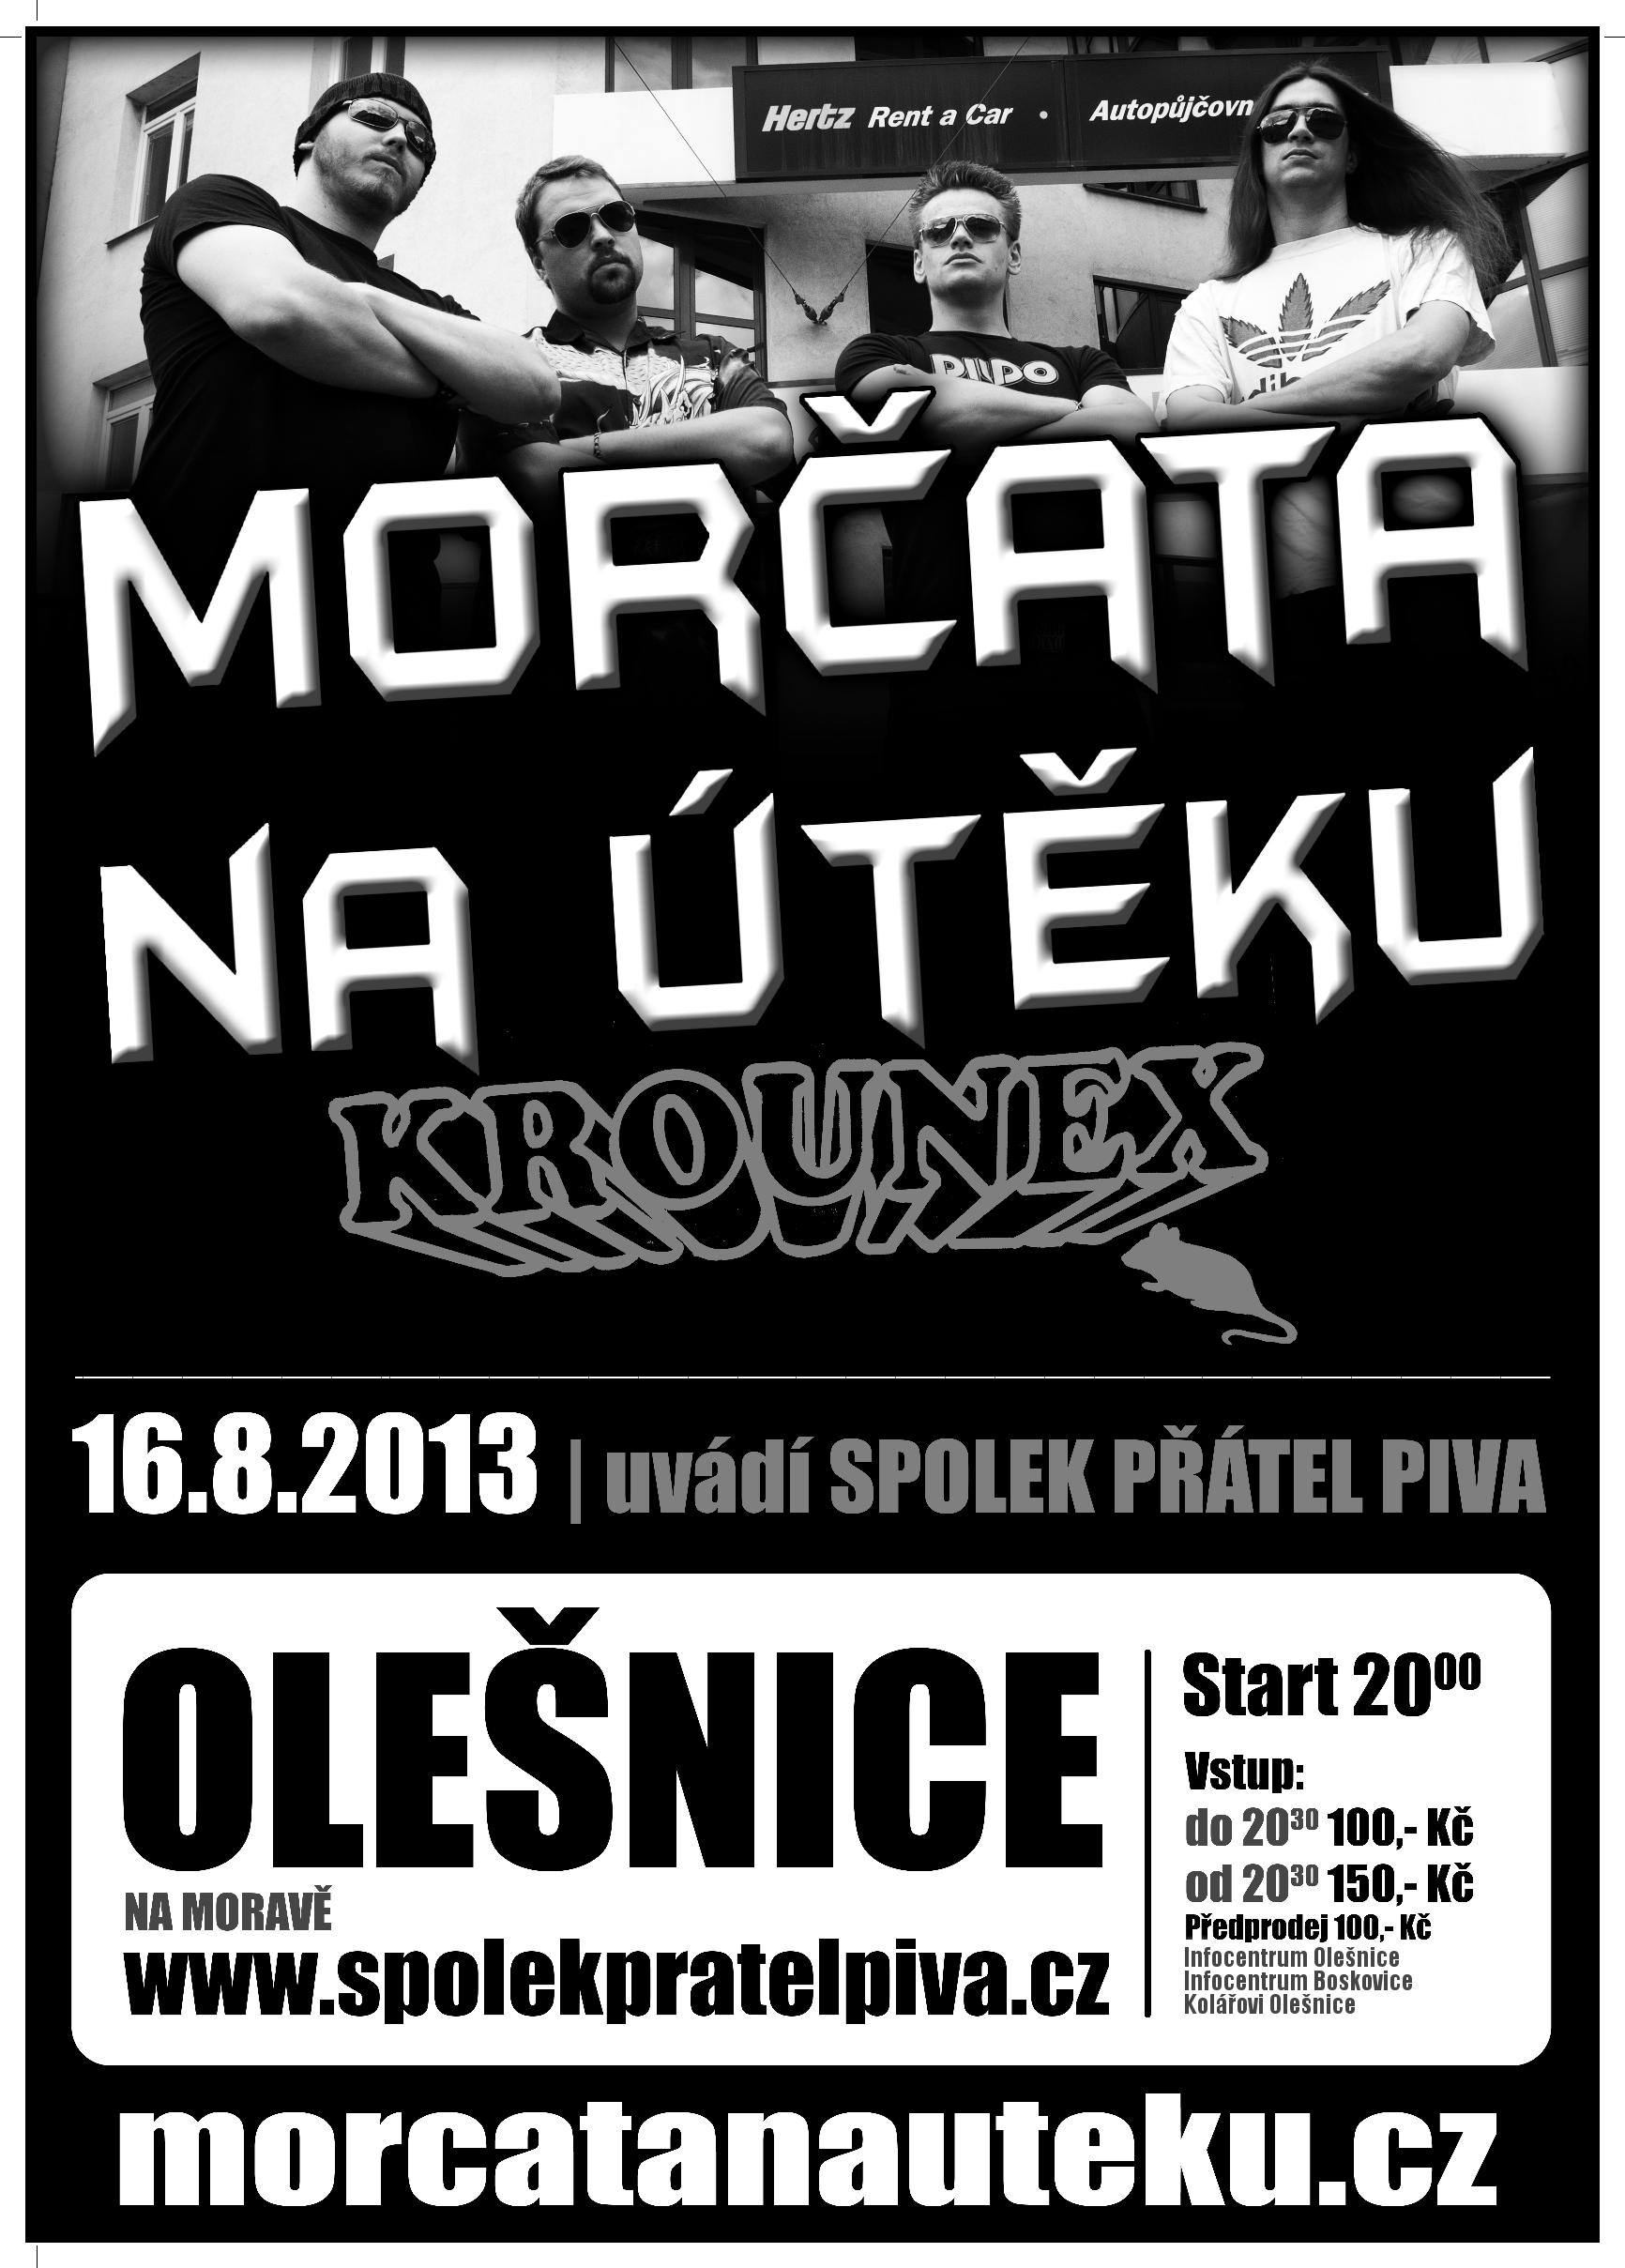 Plakát: Morčata na útěku + Krounex